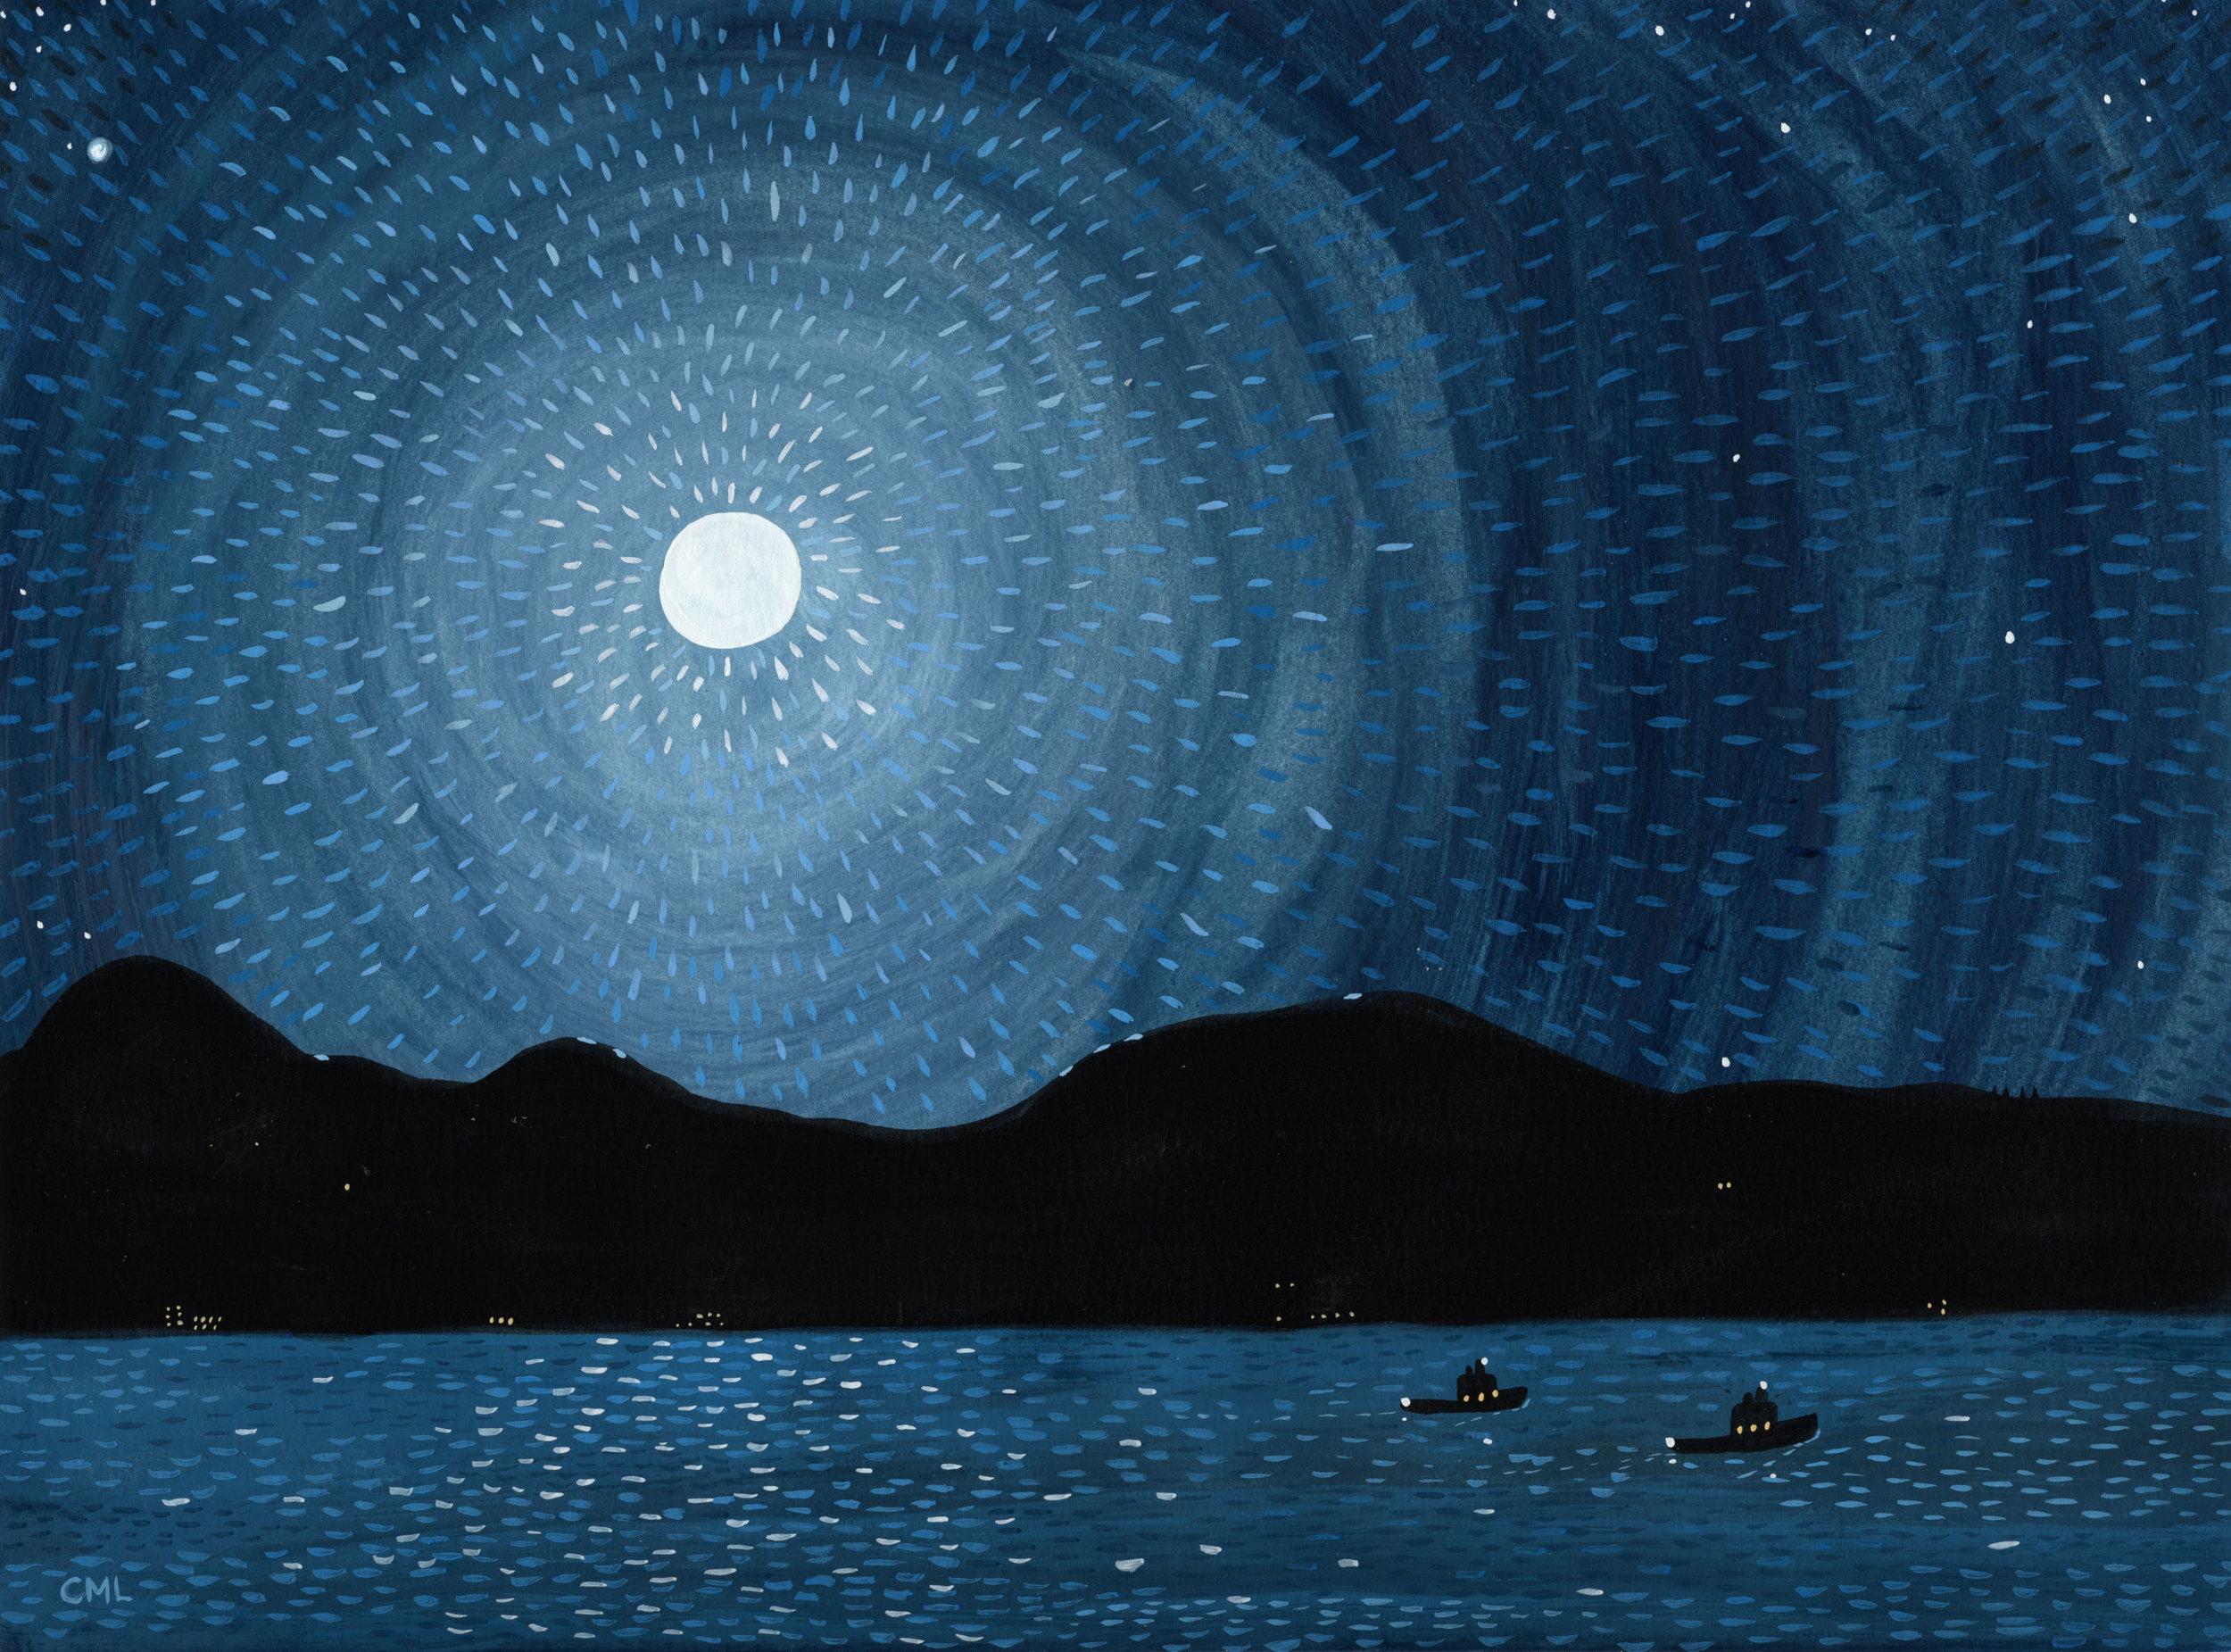 Cougar Bay at Night by Christine Marie Larsen